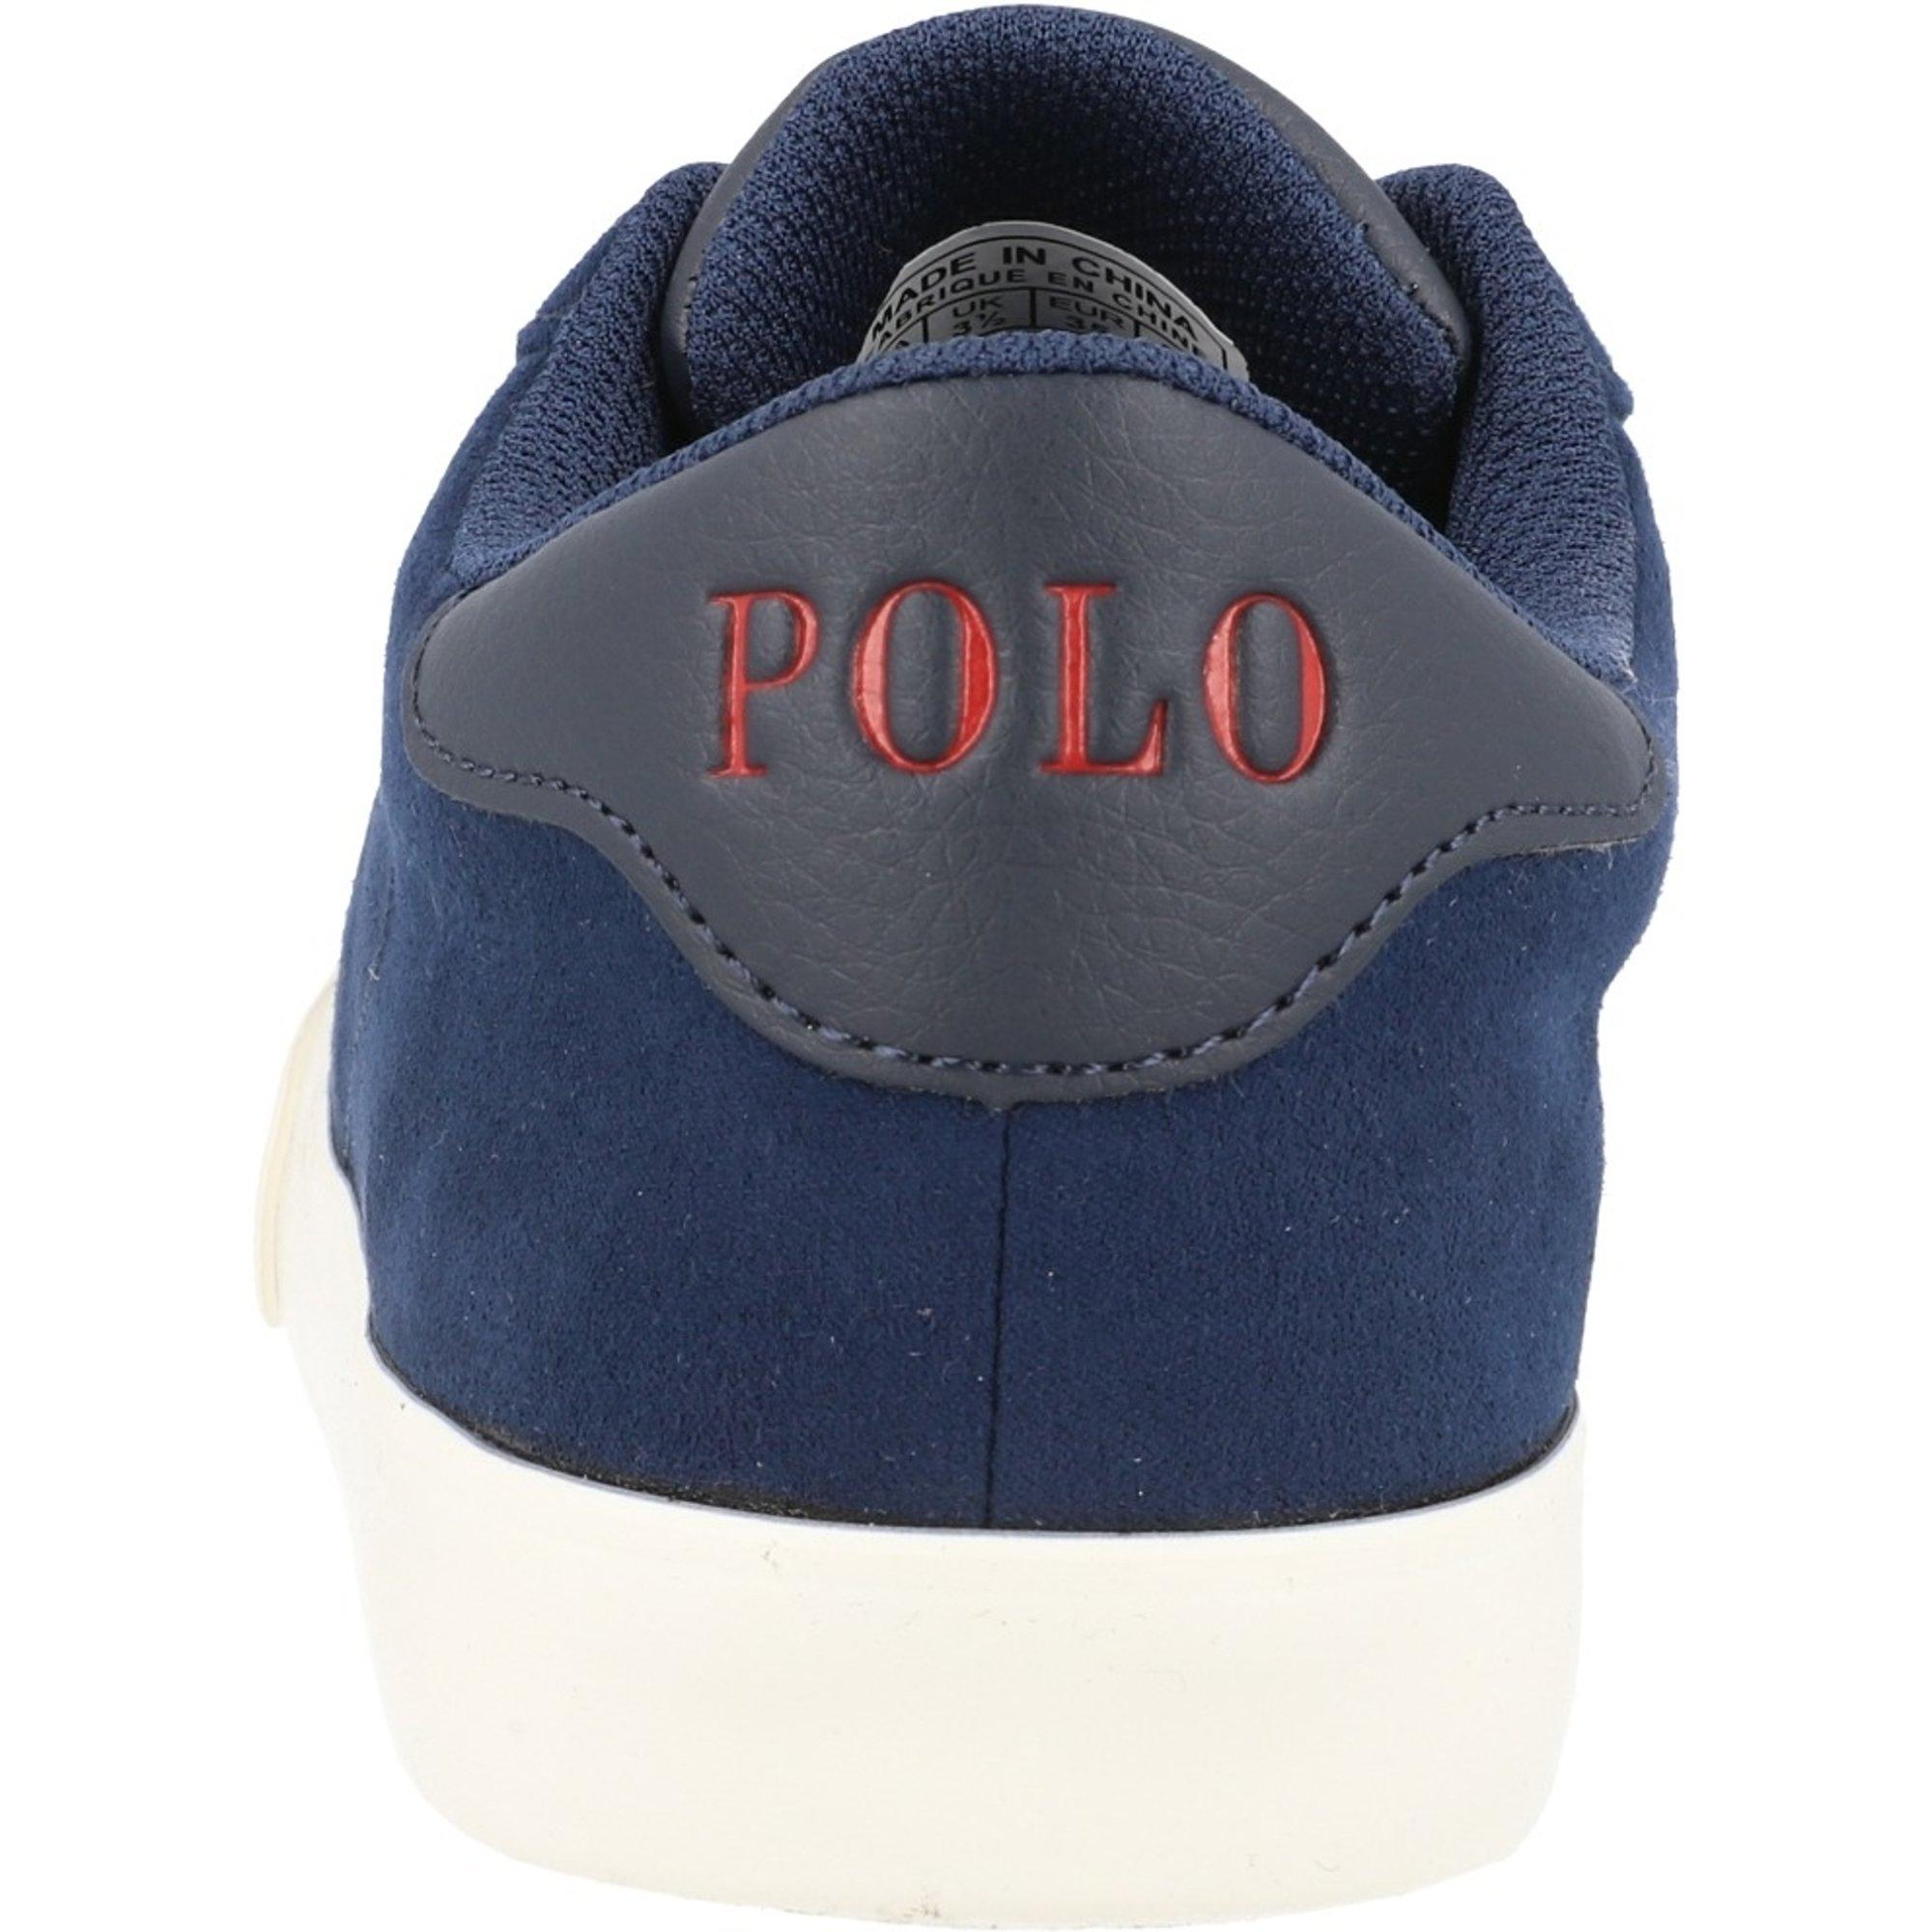 Polo Ralph Lauren Theron III J Navy/Cream Microsuede